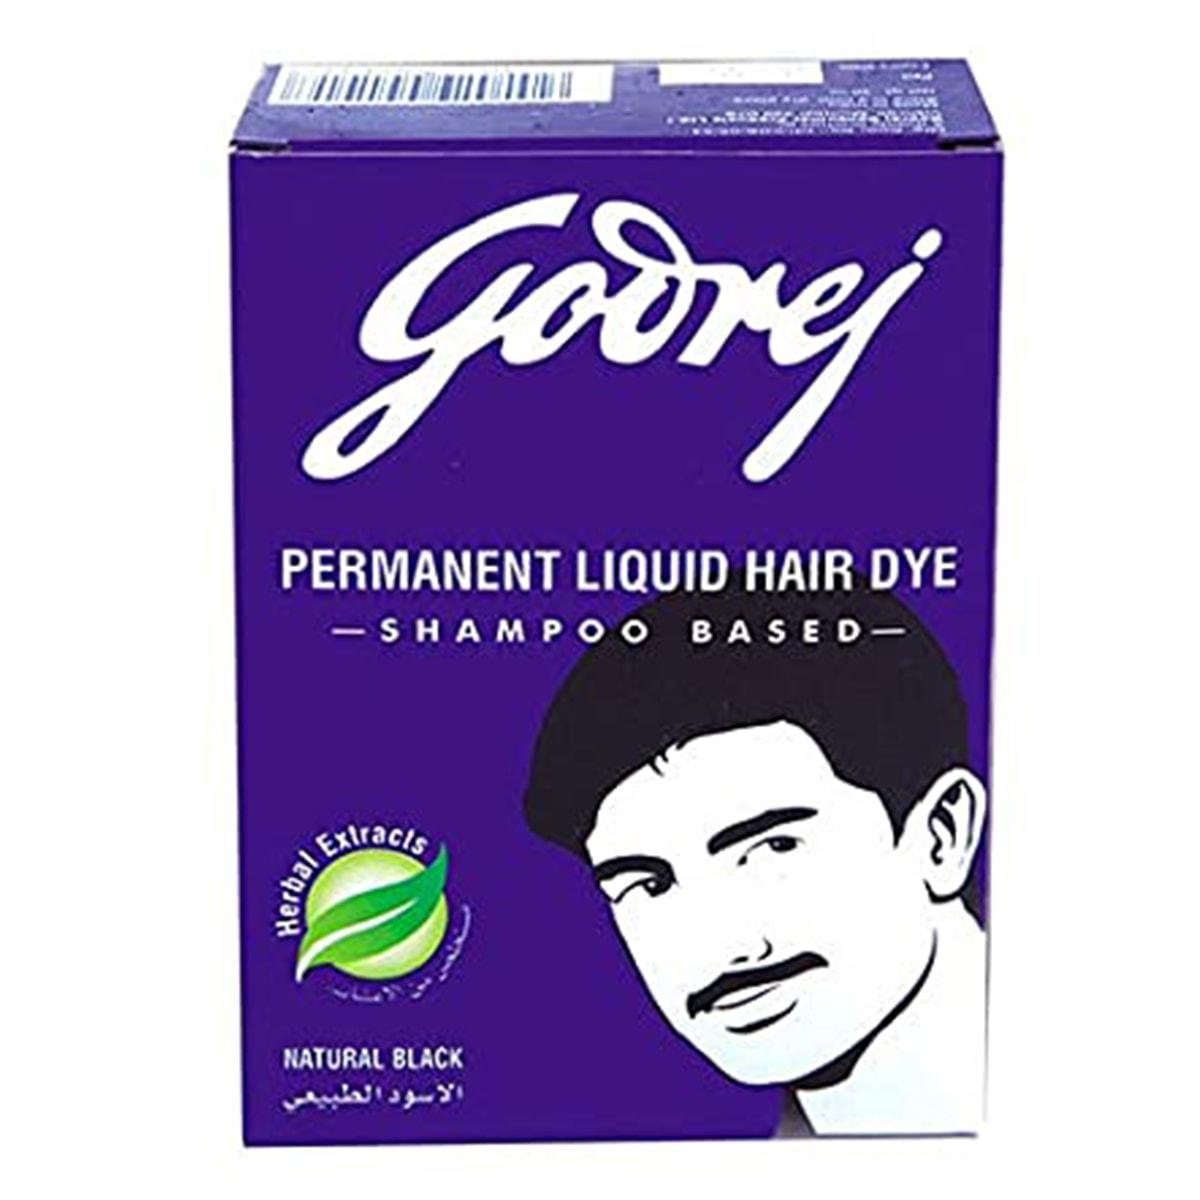 Buy Godrej Permanent Liquid Hair Dye (Natural Black ) - 40 ml